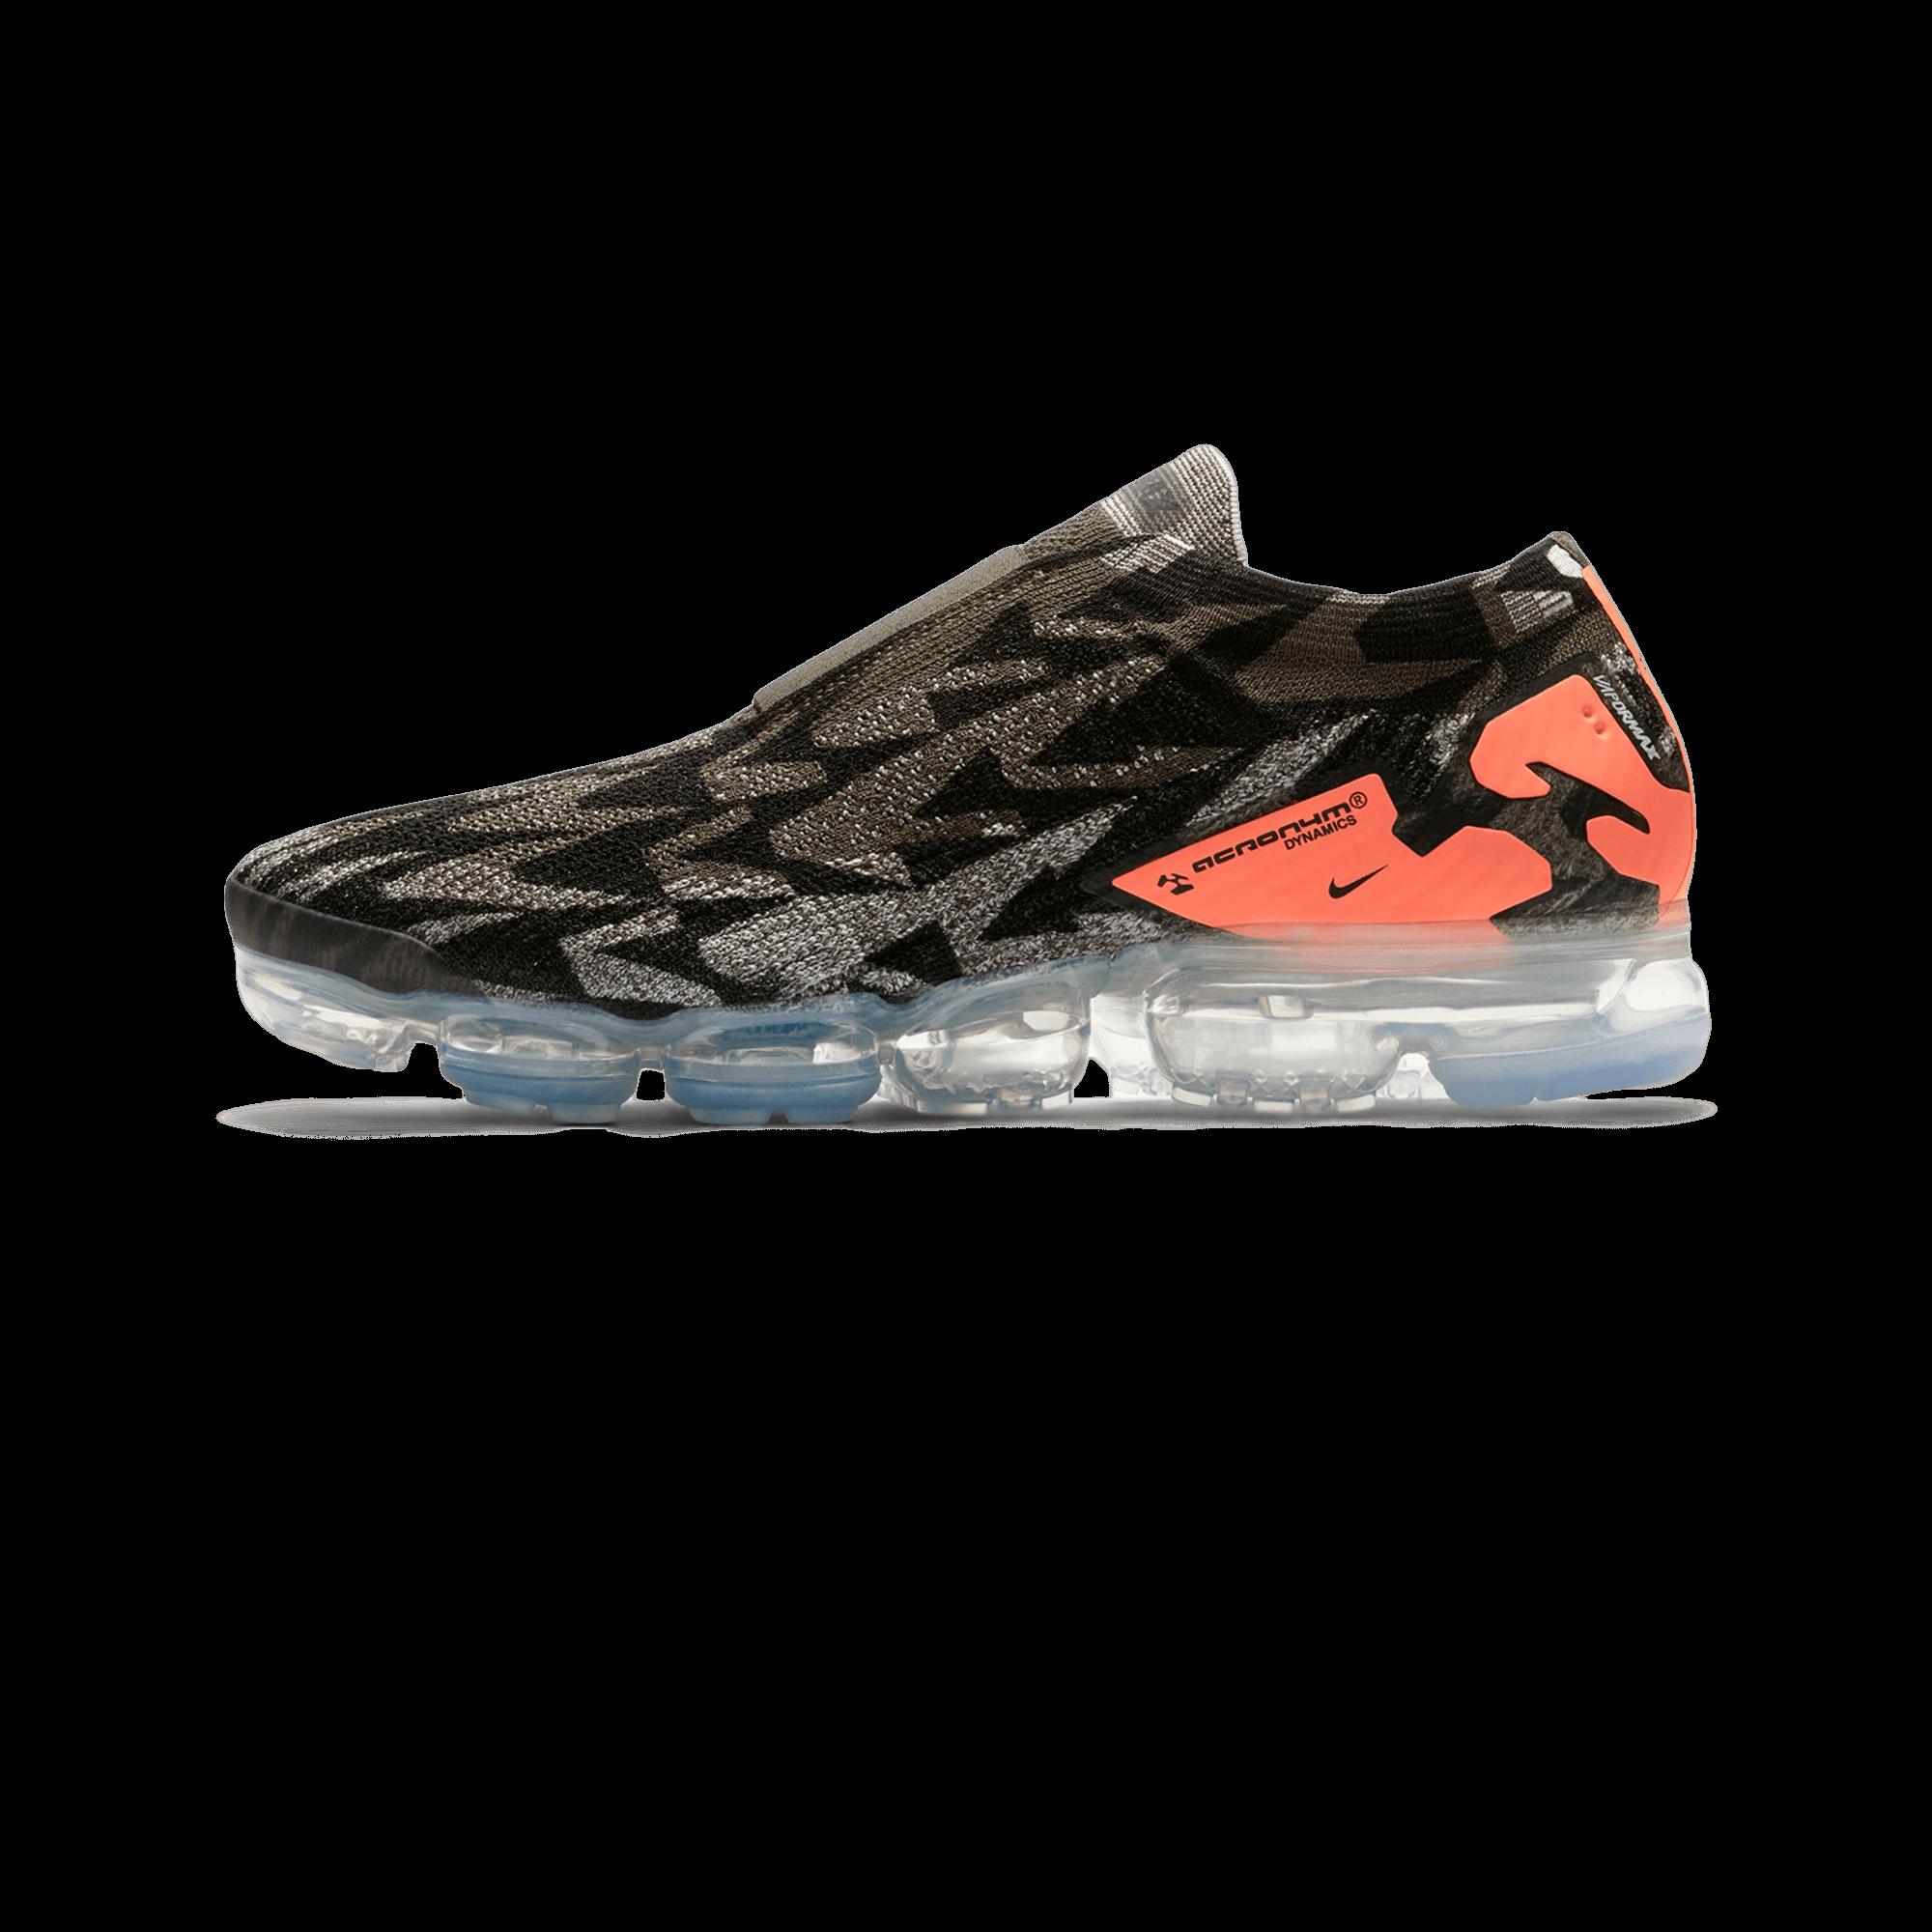 online retailer reputable site most popular Nike Air Vapormax FK Moc 2 X Acronym black / orange - Men | Holypopstore.com